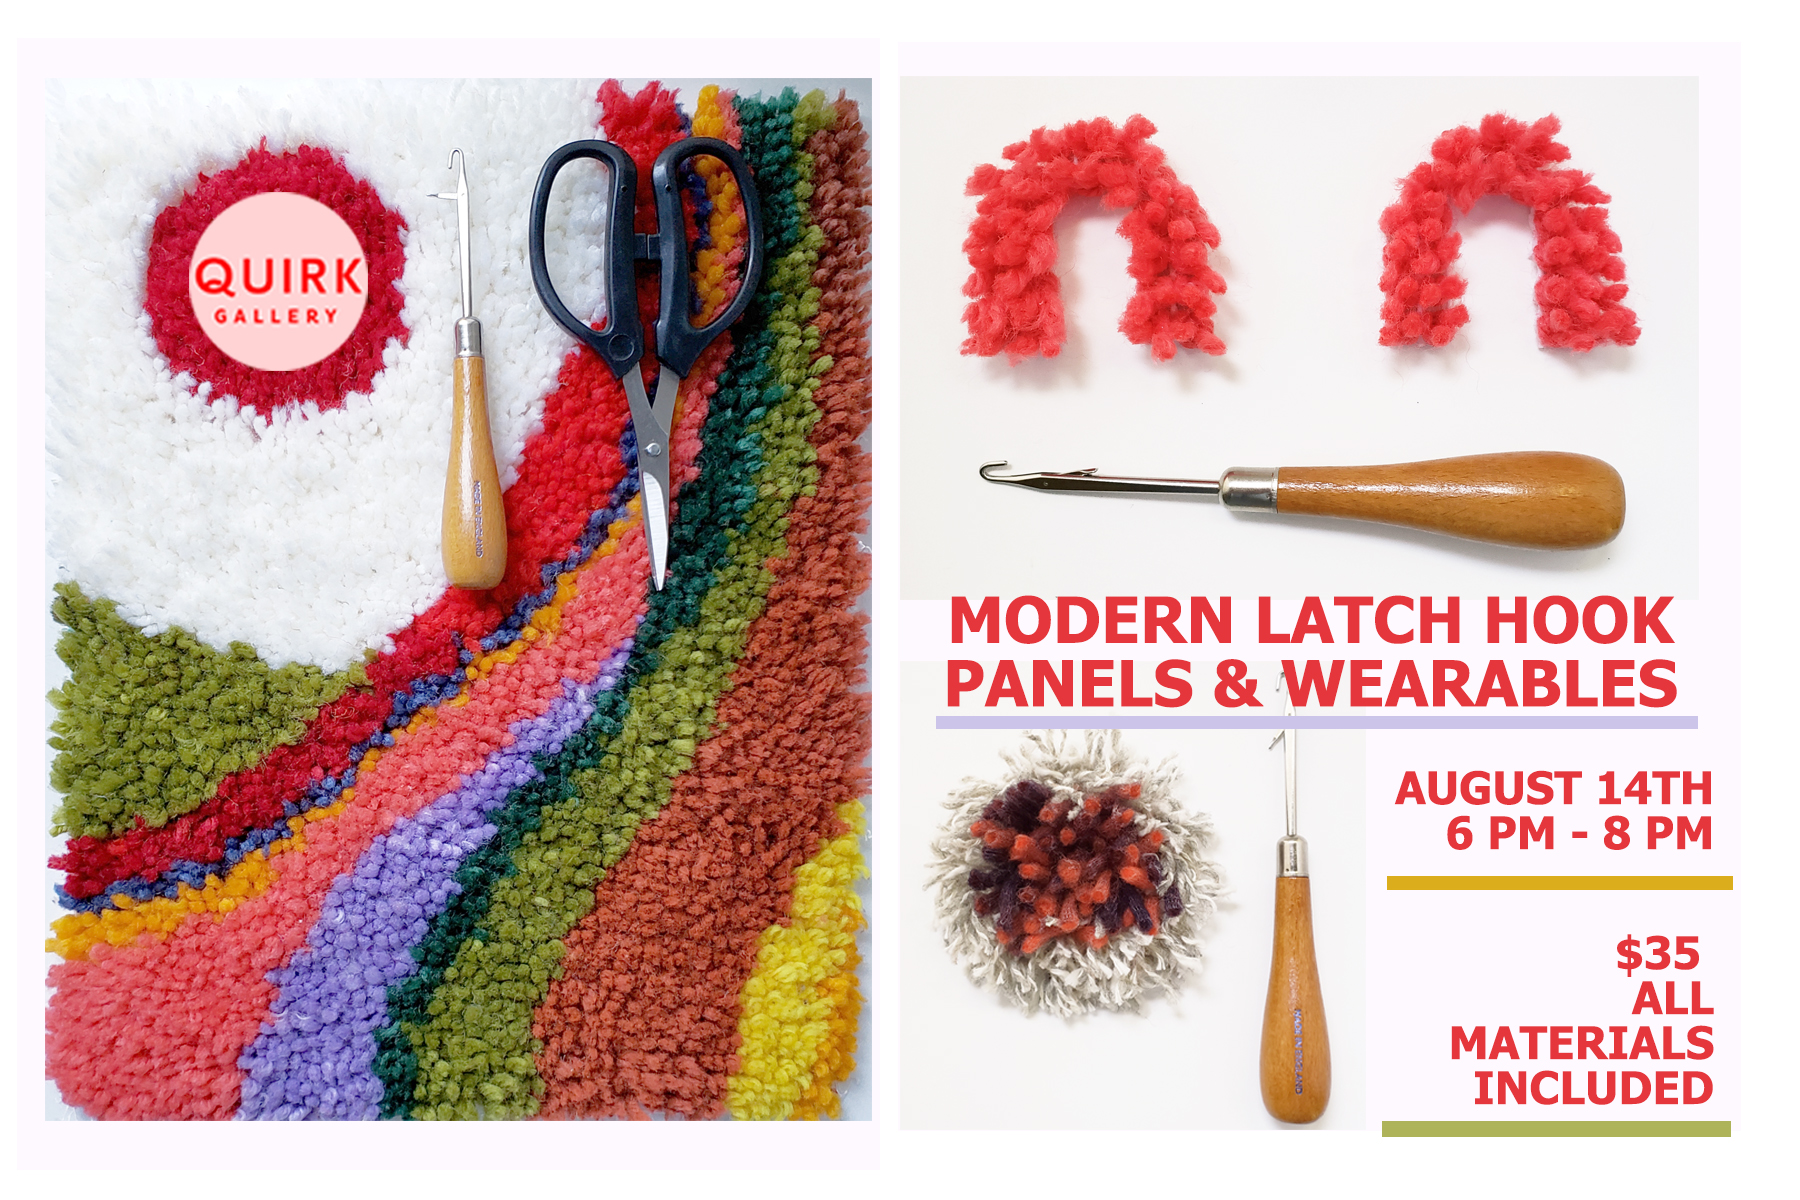 Modern Latch Hook Panels and Wearables.jpg